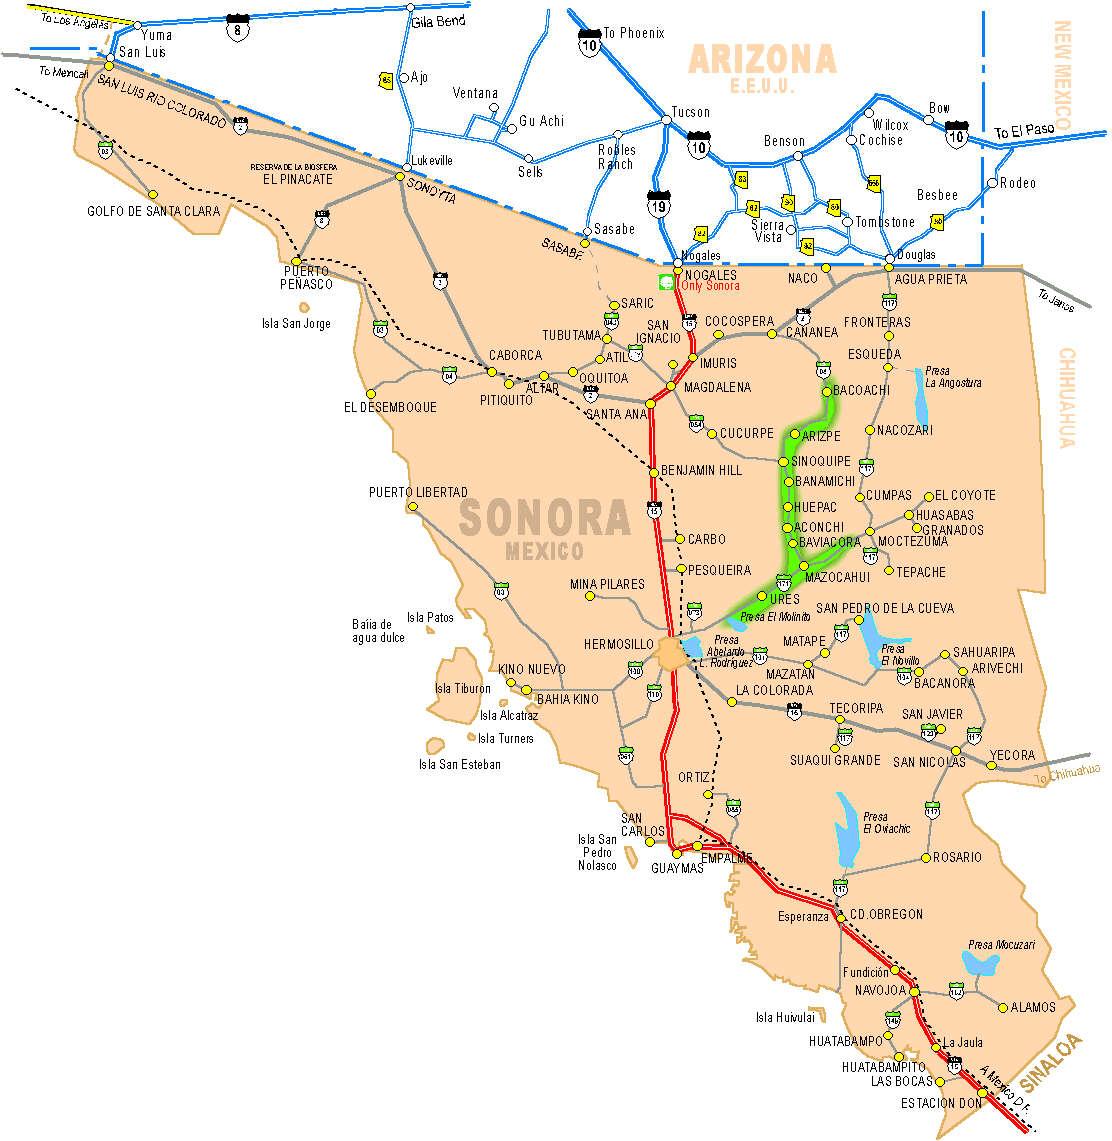 mapa de tx with Map Of Sonora on Citymap furthermore Las Iglesias Catolicas Mas Grandes Del Mundo further Mexico texas 1845 also Shanghai Street Map additionally Texas County Map.